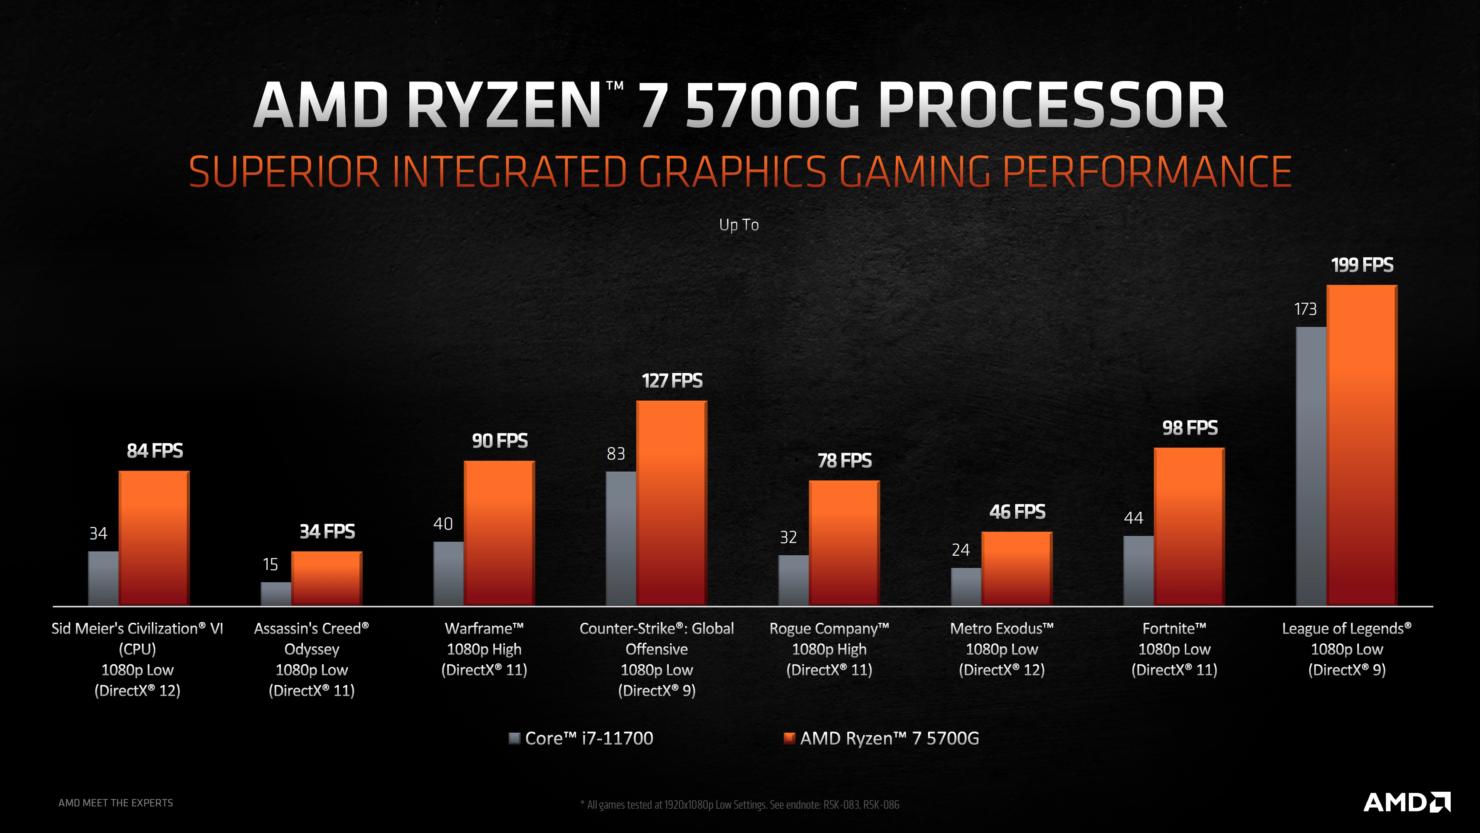 amd-ryzen-5000g-desktop-apus-launch-_-ryzen-7-5700g-ryzen-5-5600g-_7